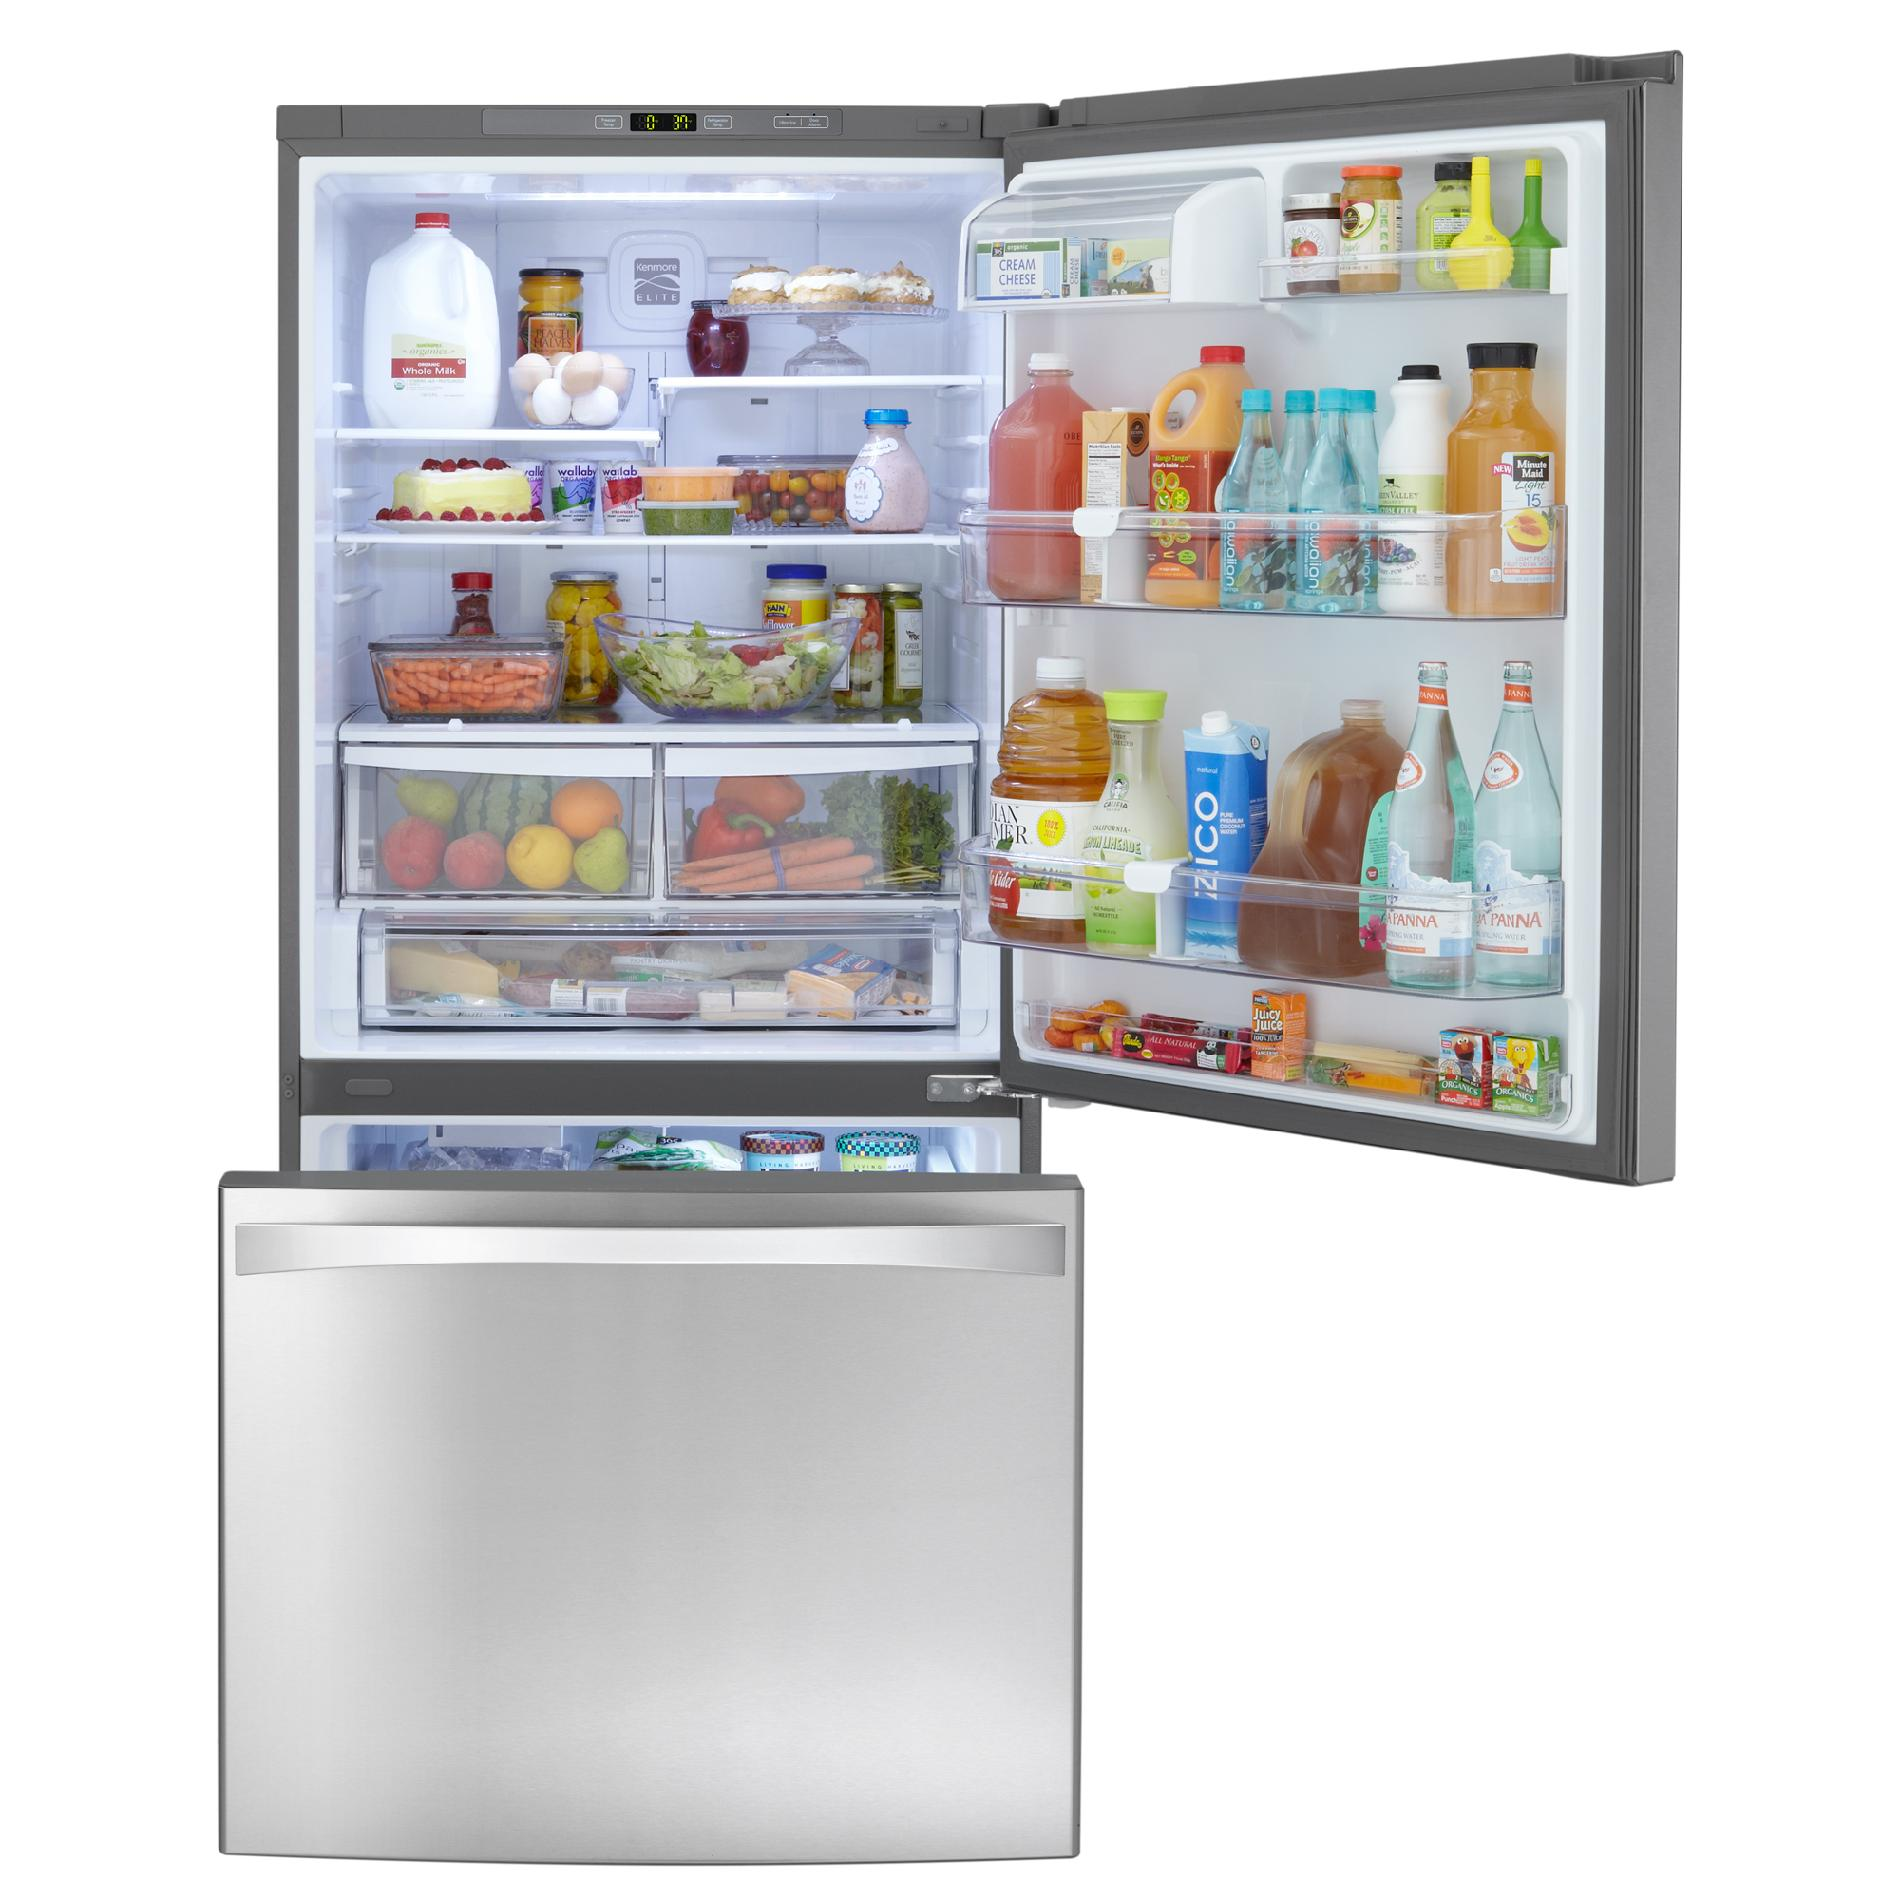 Kenmore Elite 24 cu. ft. Bottom-Freezer Refrigerator – Stainless Steel